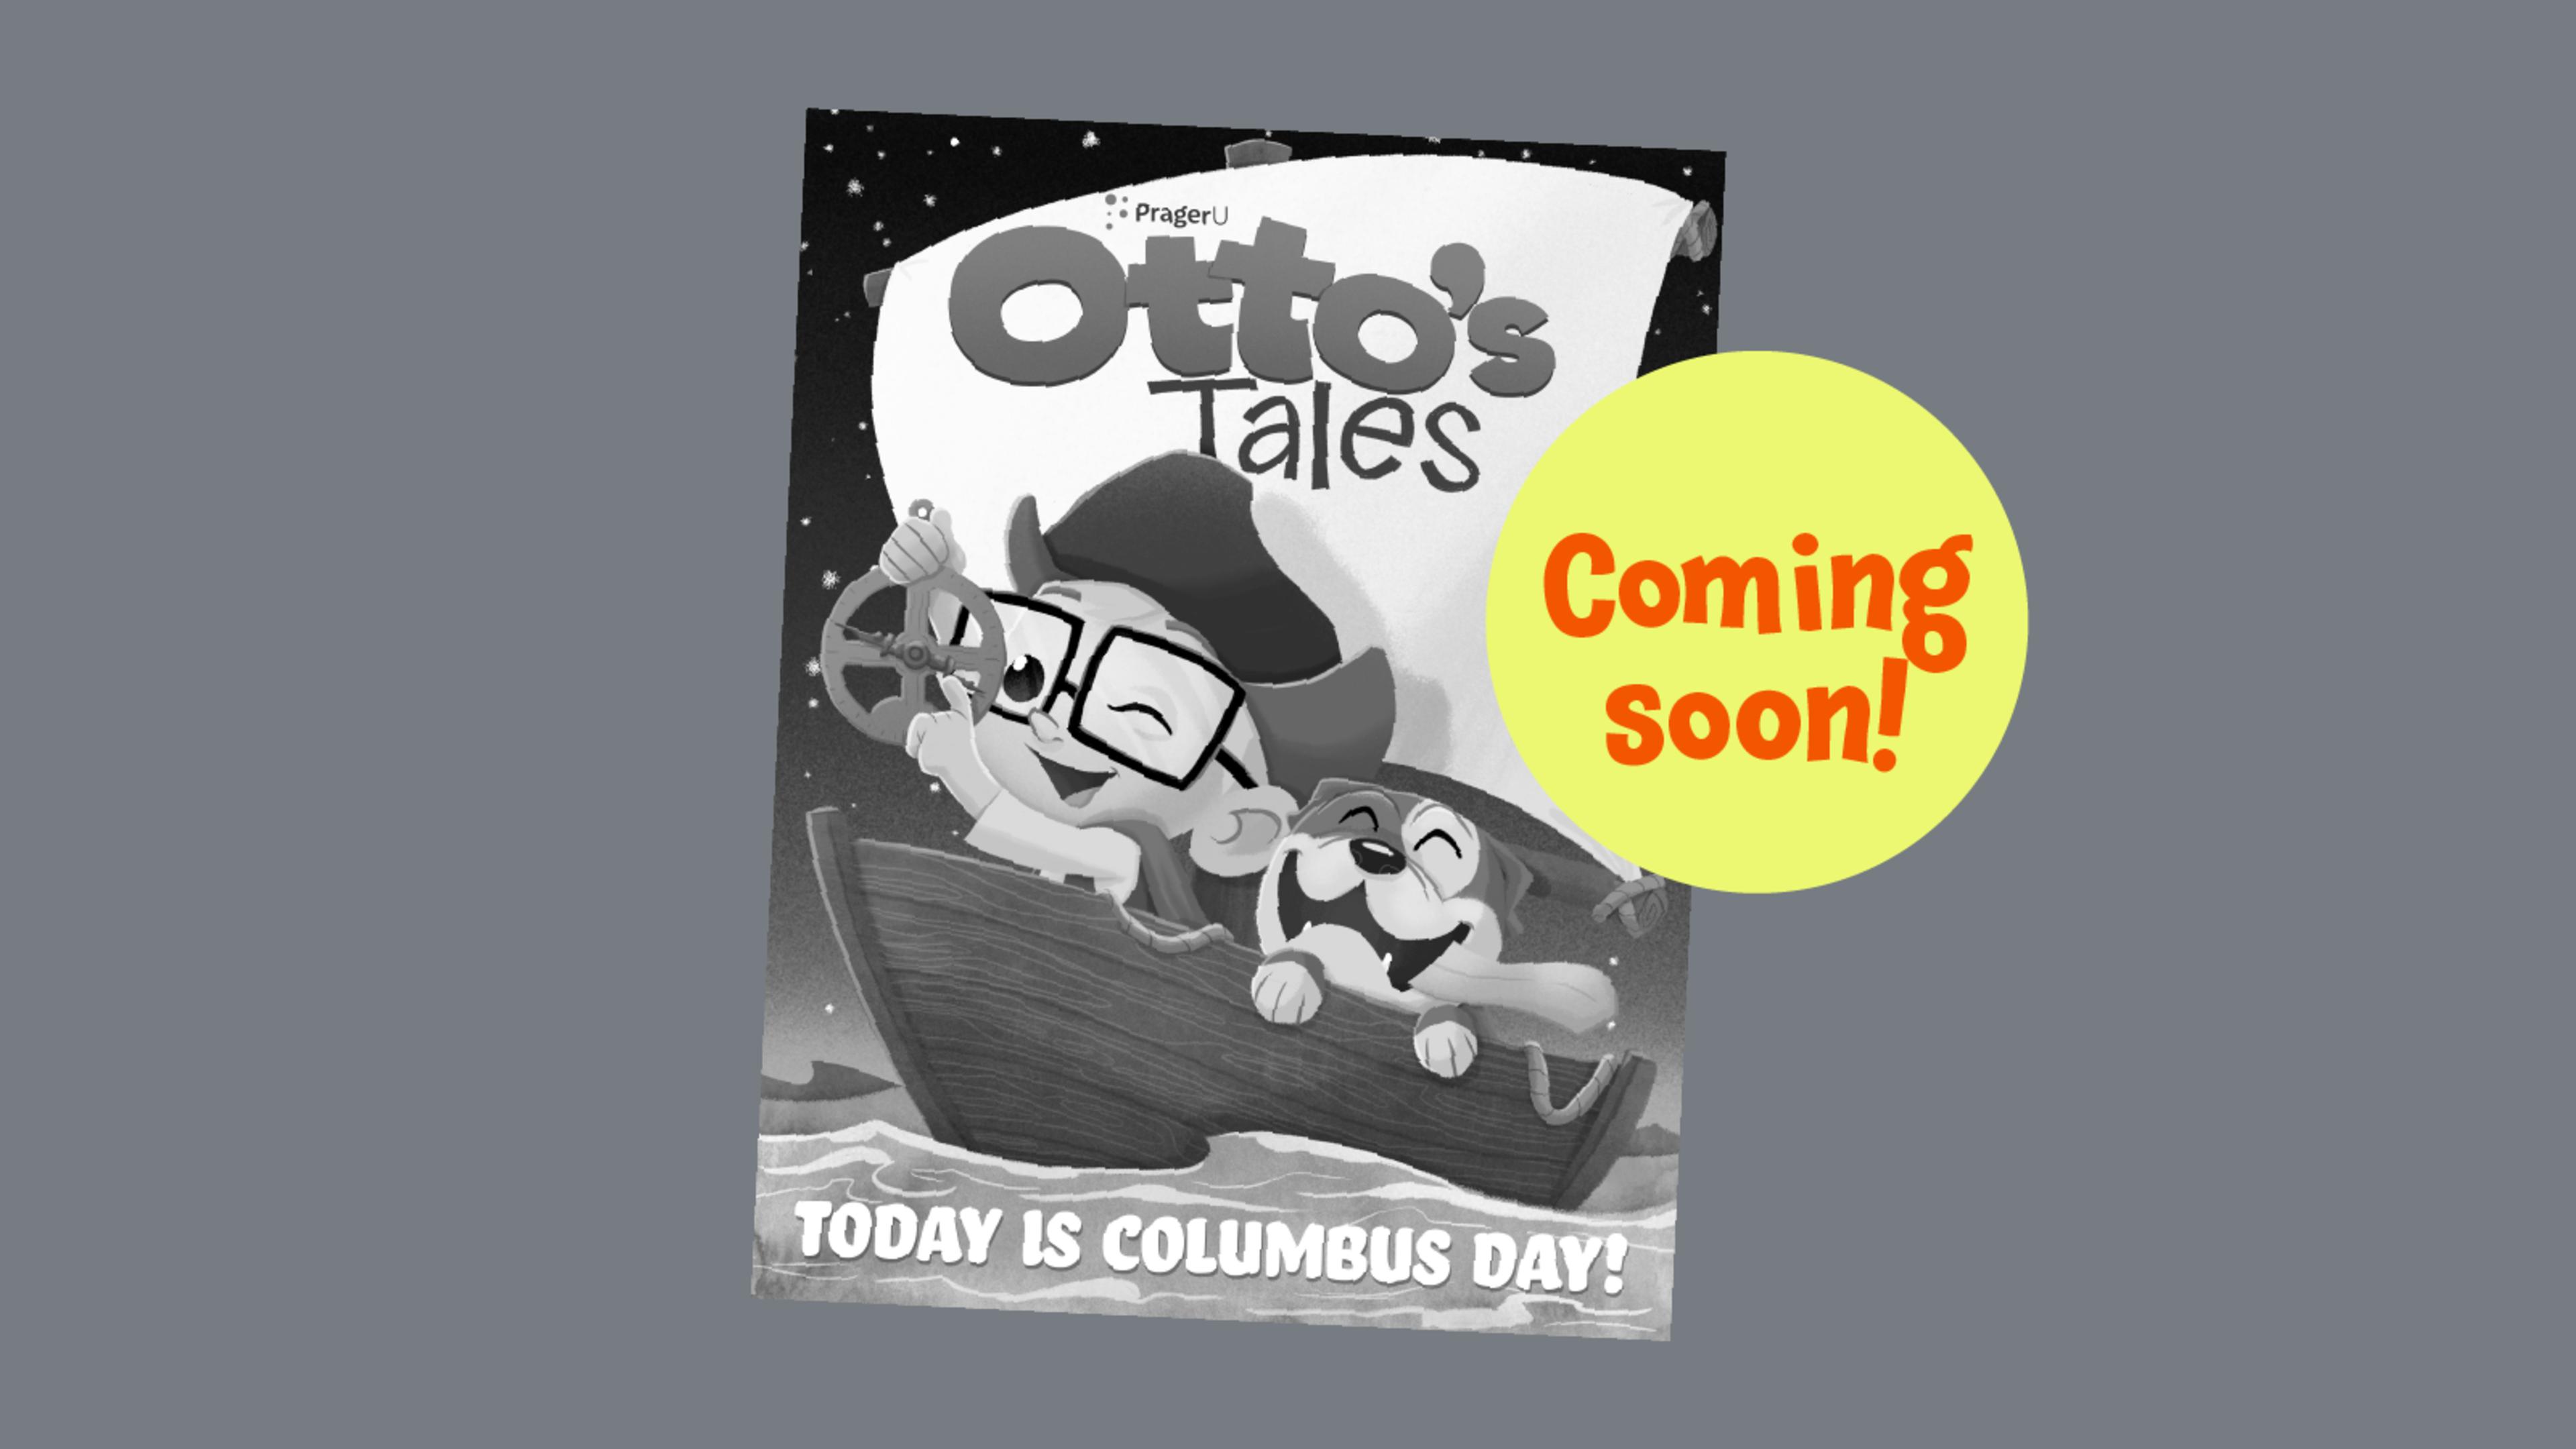 OttosTales ColumbusDay ComingSoon